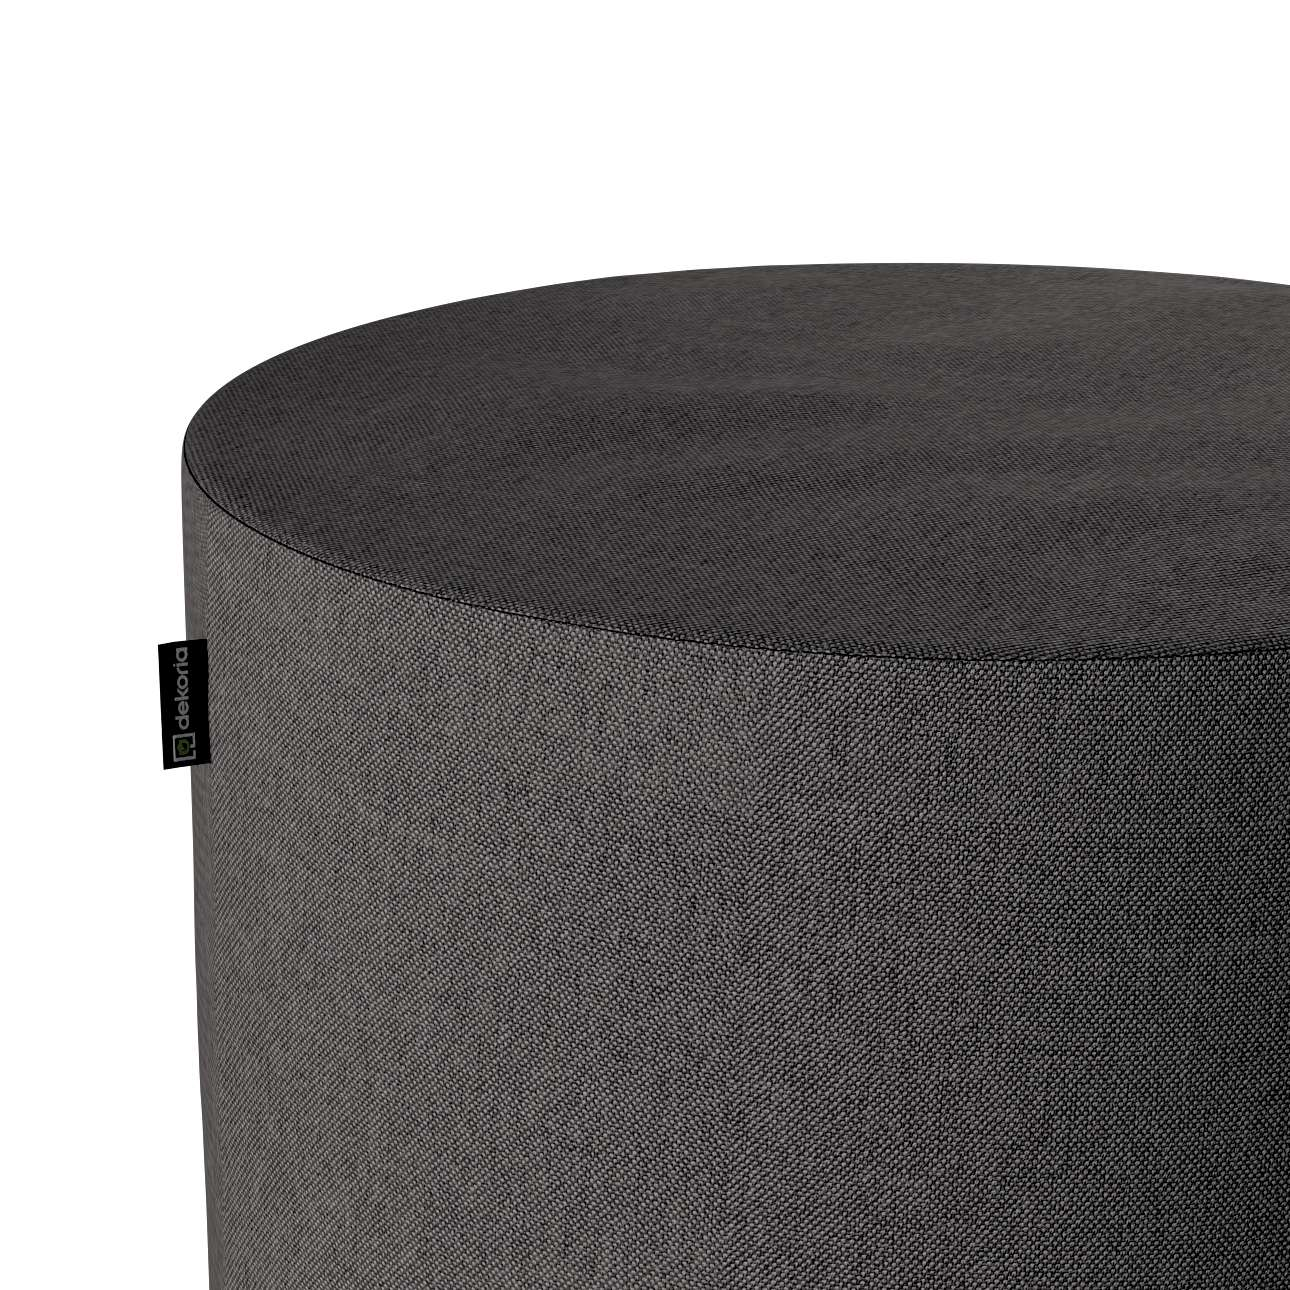 Pouf Barrel von der Kollektion Etna, Stoff: 705-35